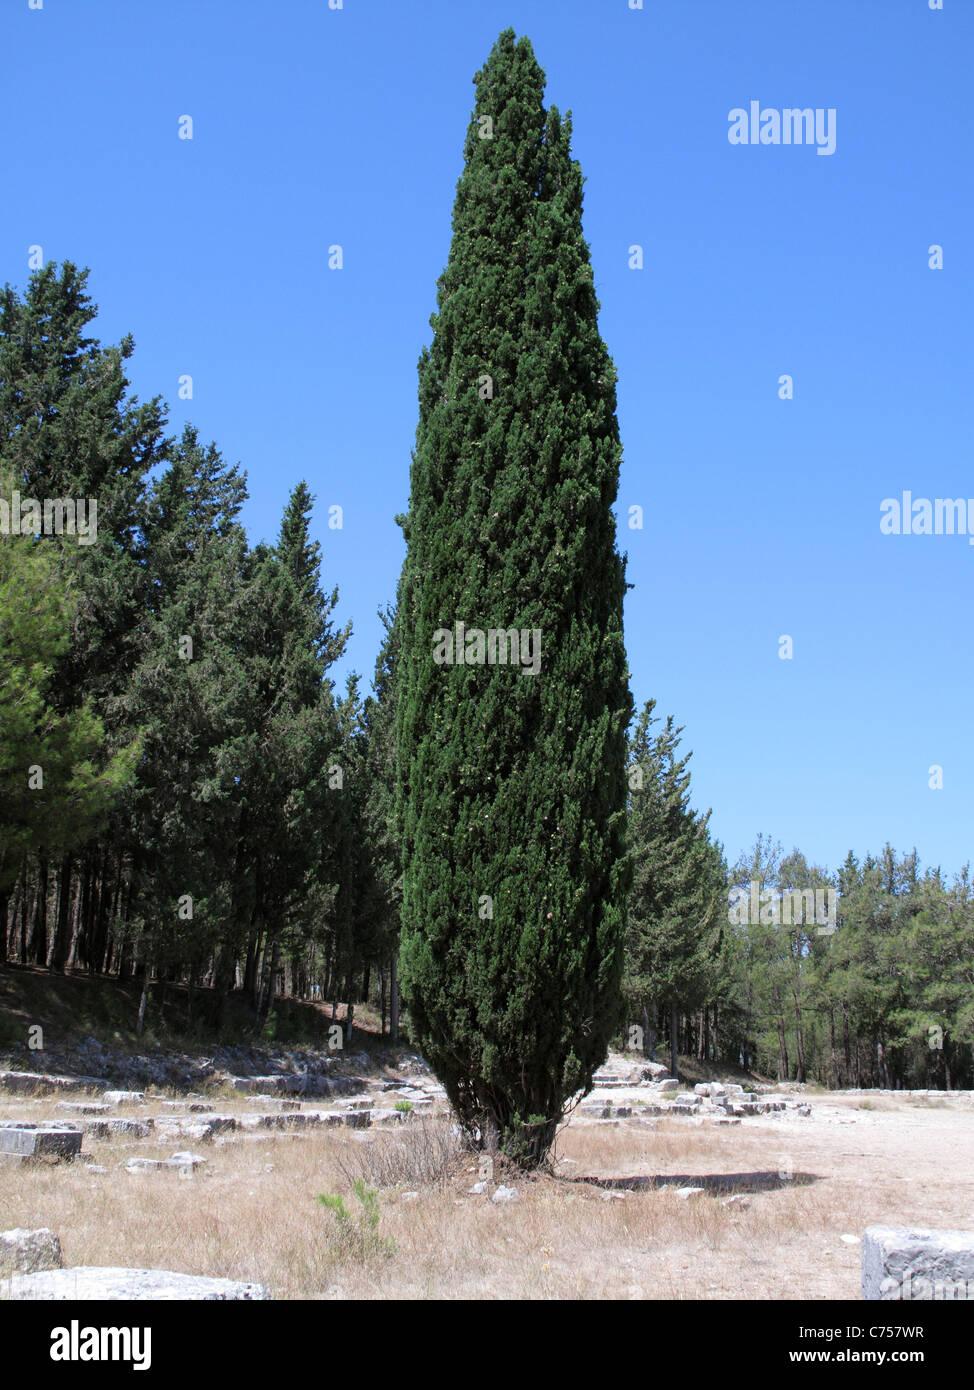 Mediterranean or Italian cypress tree (Cupressus sempervirens) Kos, August - Stock Image